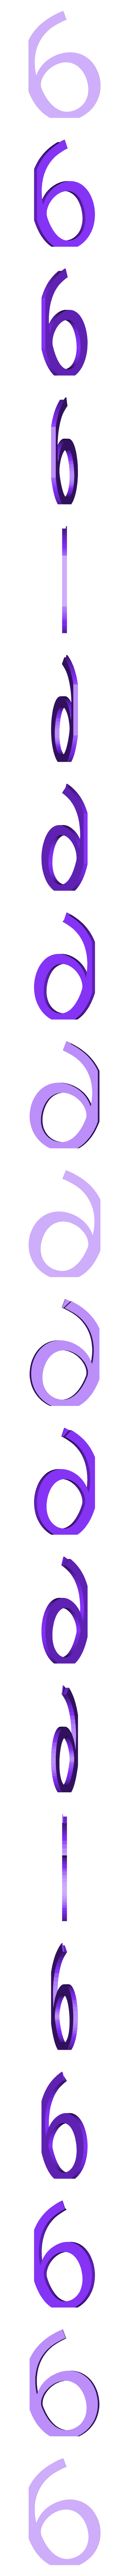 logo_100_9.stl Download free STL file iPhone6 case • Design to 3D print, tofuji